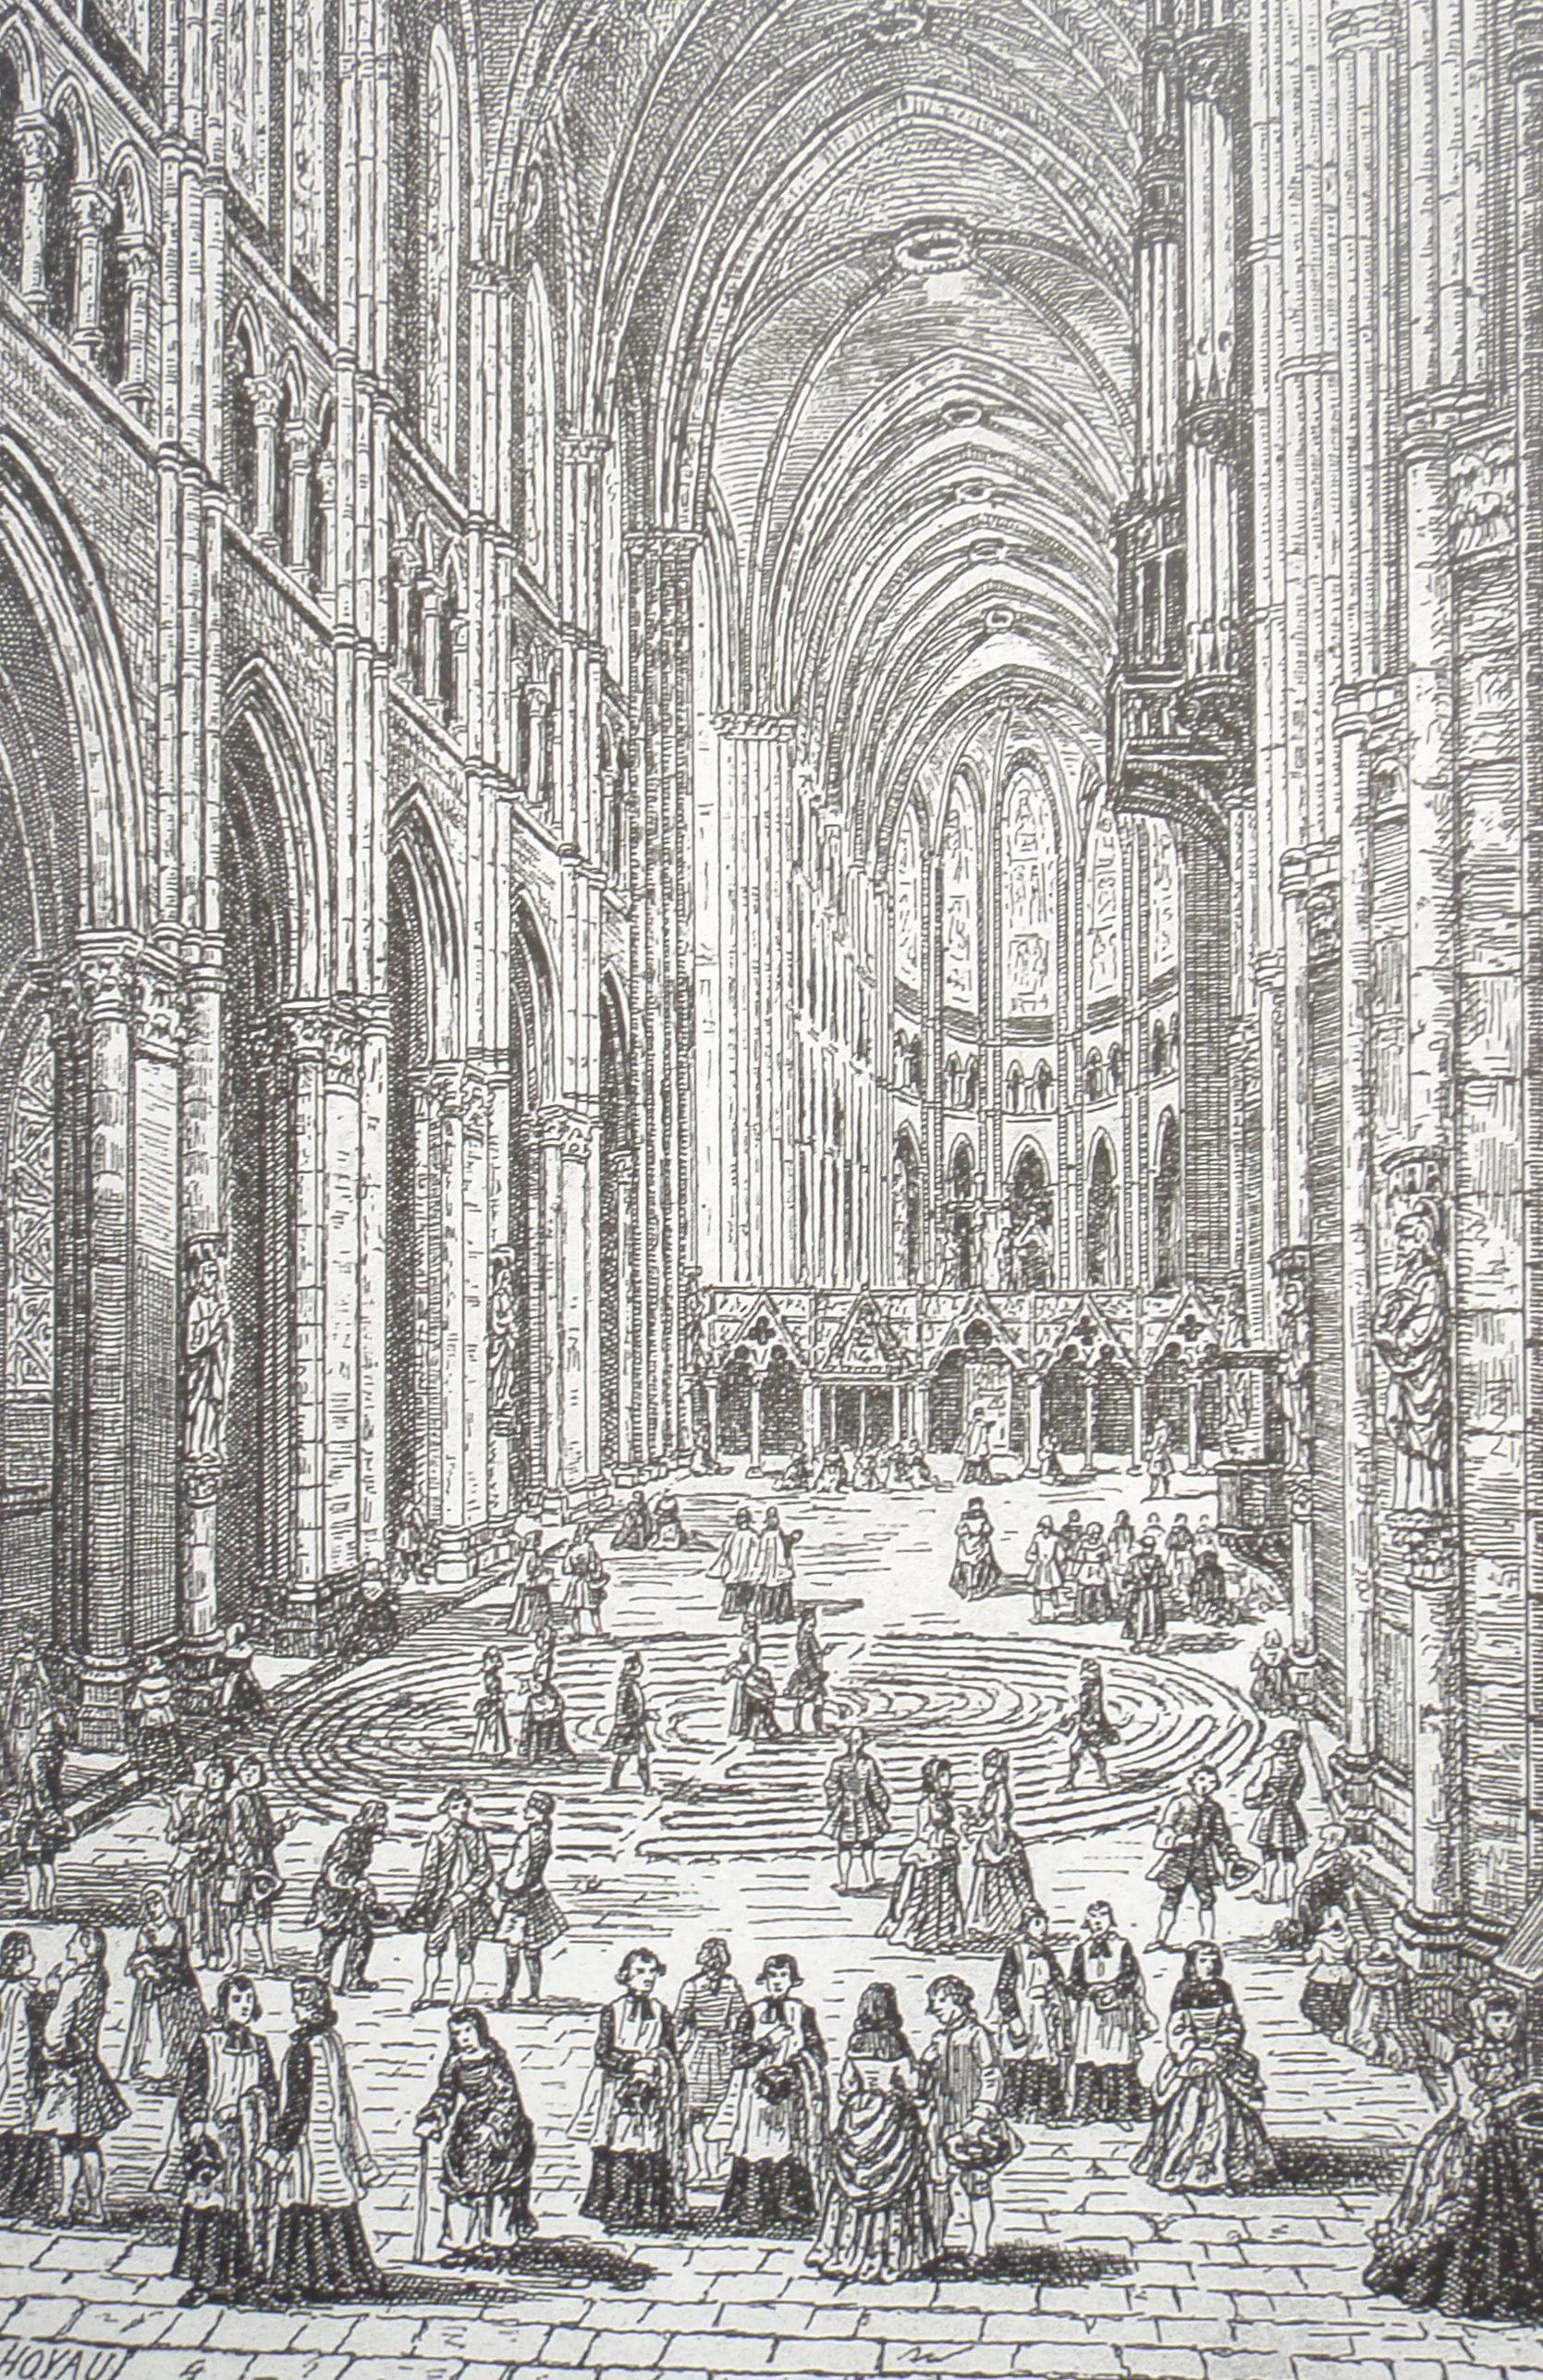 https://i2.wp.com/upload.wikimedia.org/wikipedia/commons/2/20/Inneres_der_Kathedrale.jpg